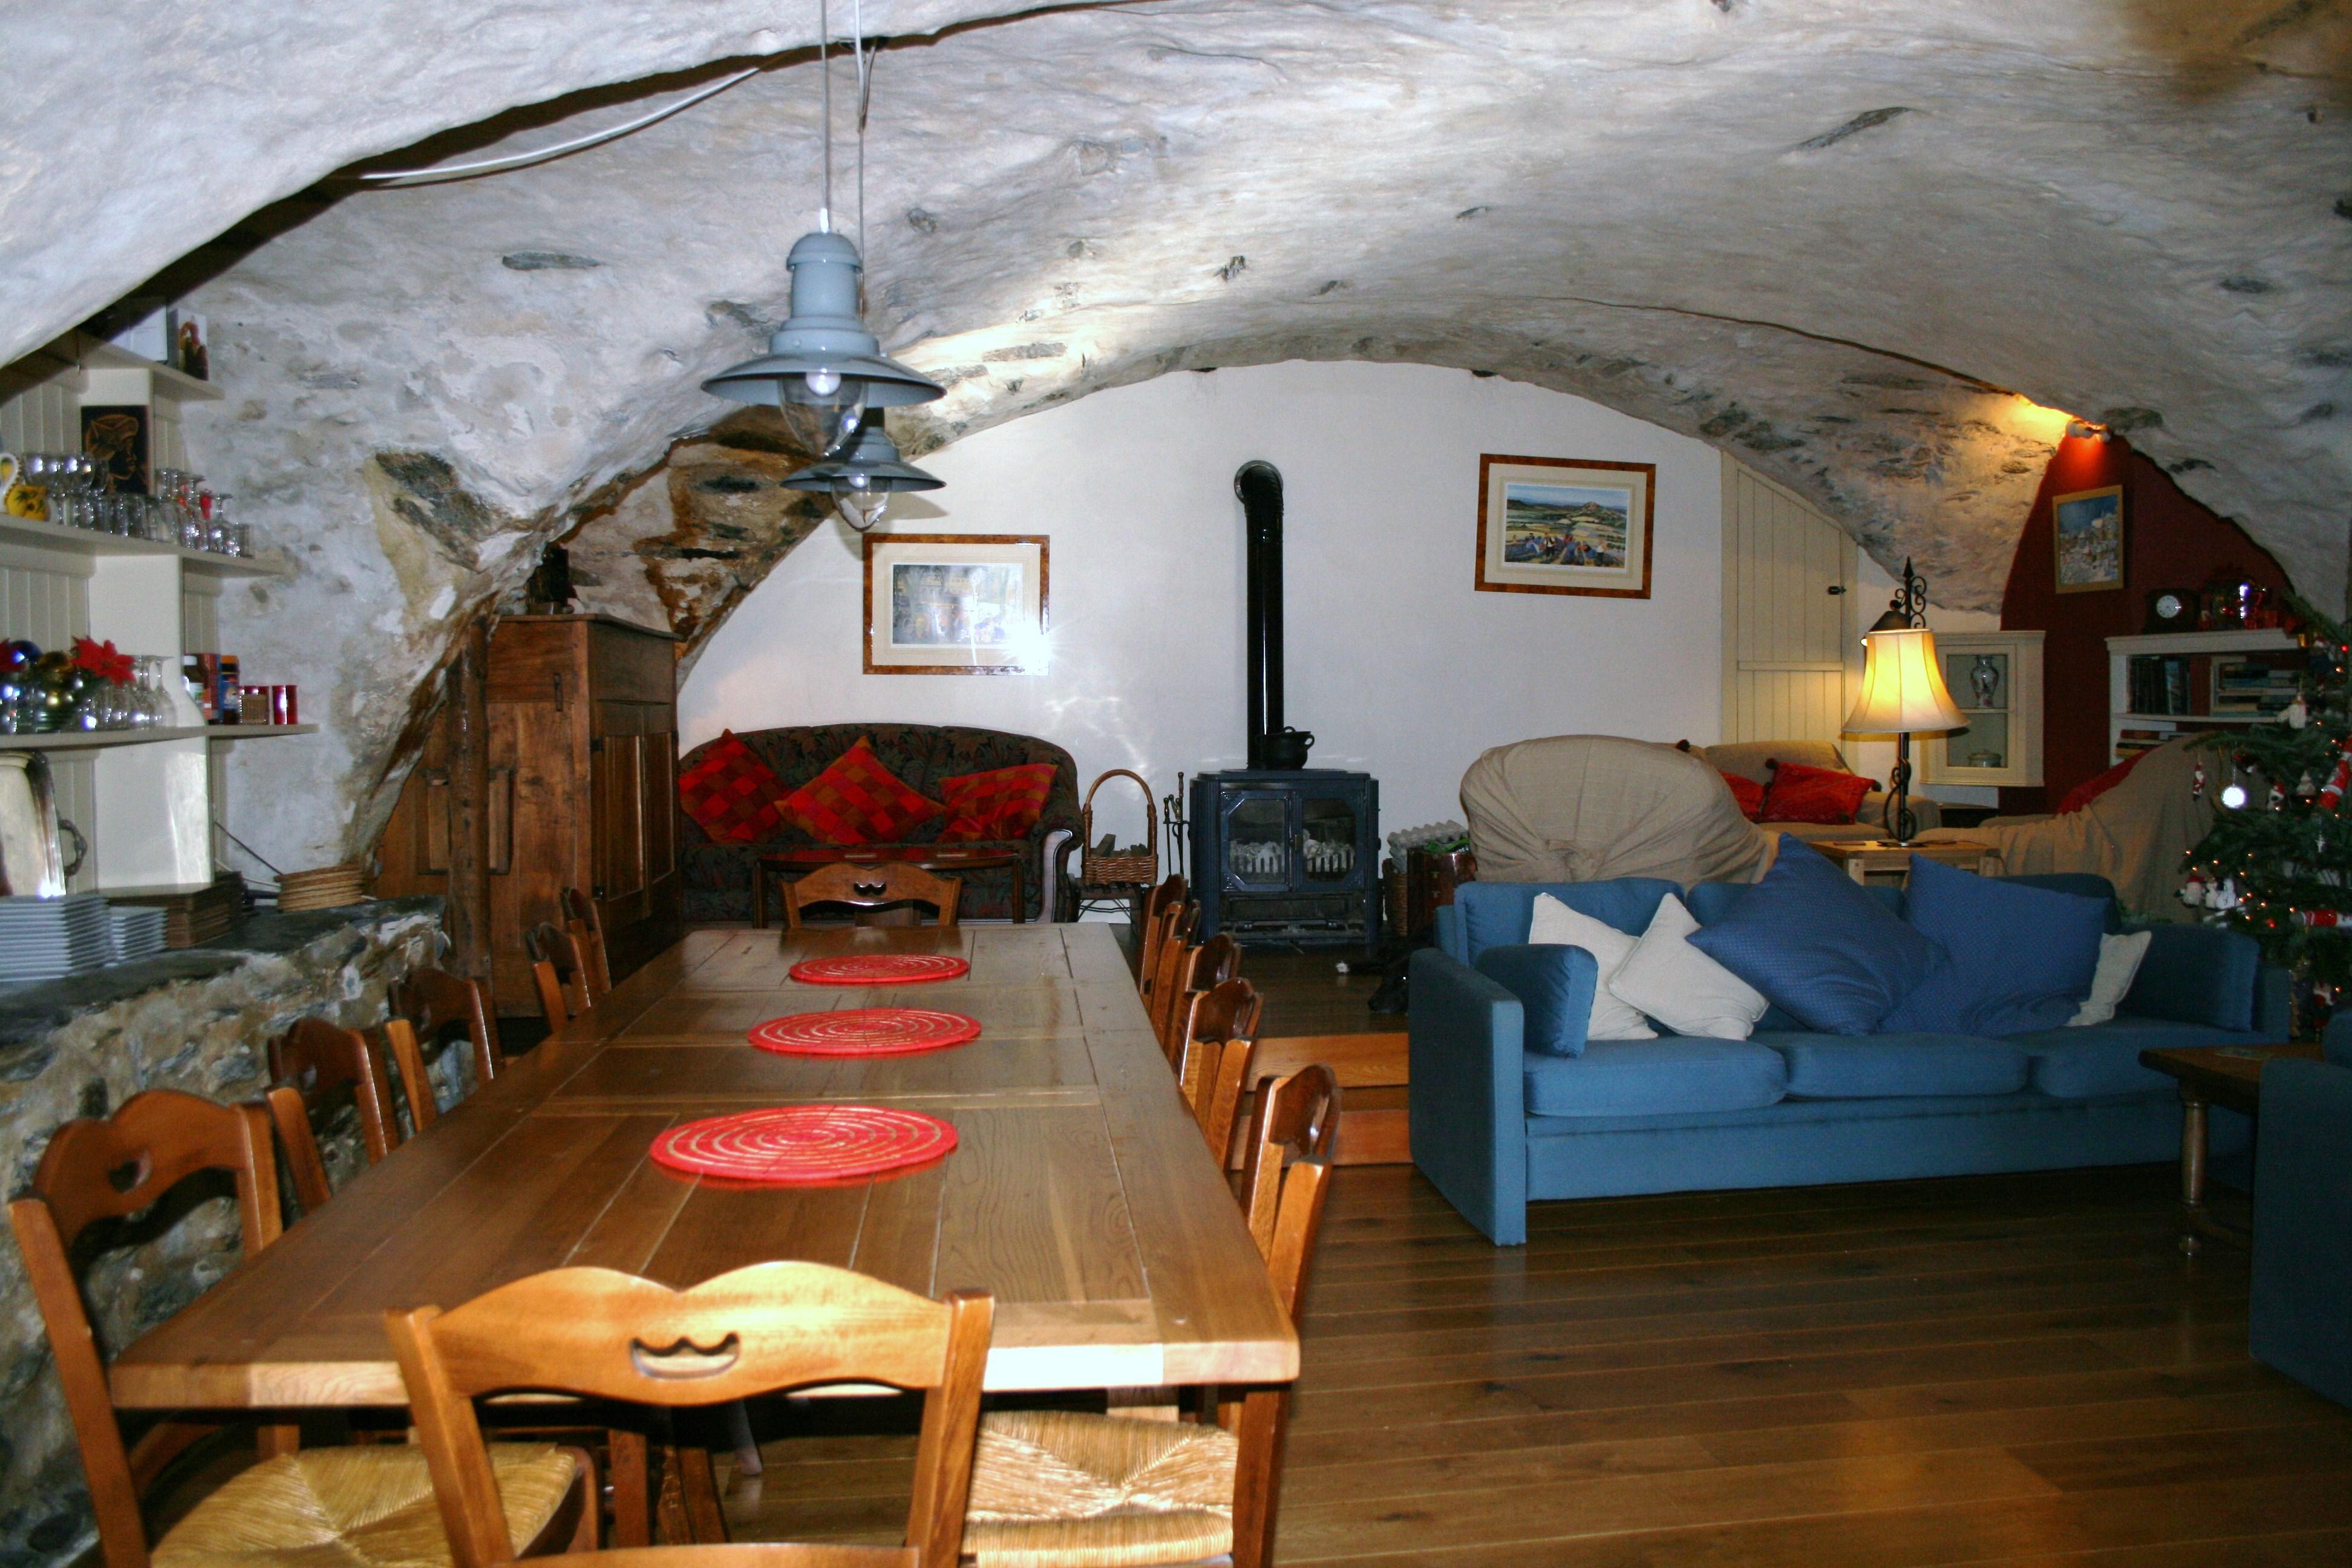 Chalet La Source interior December 2015 008